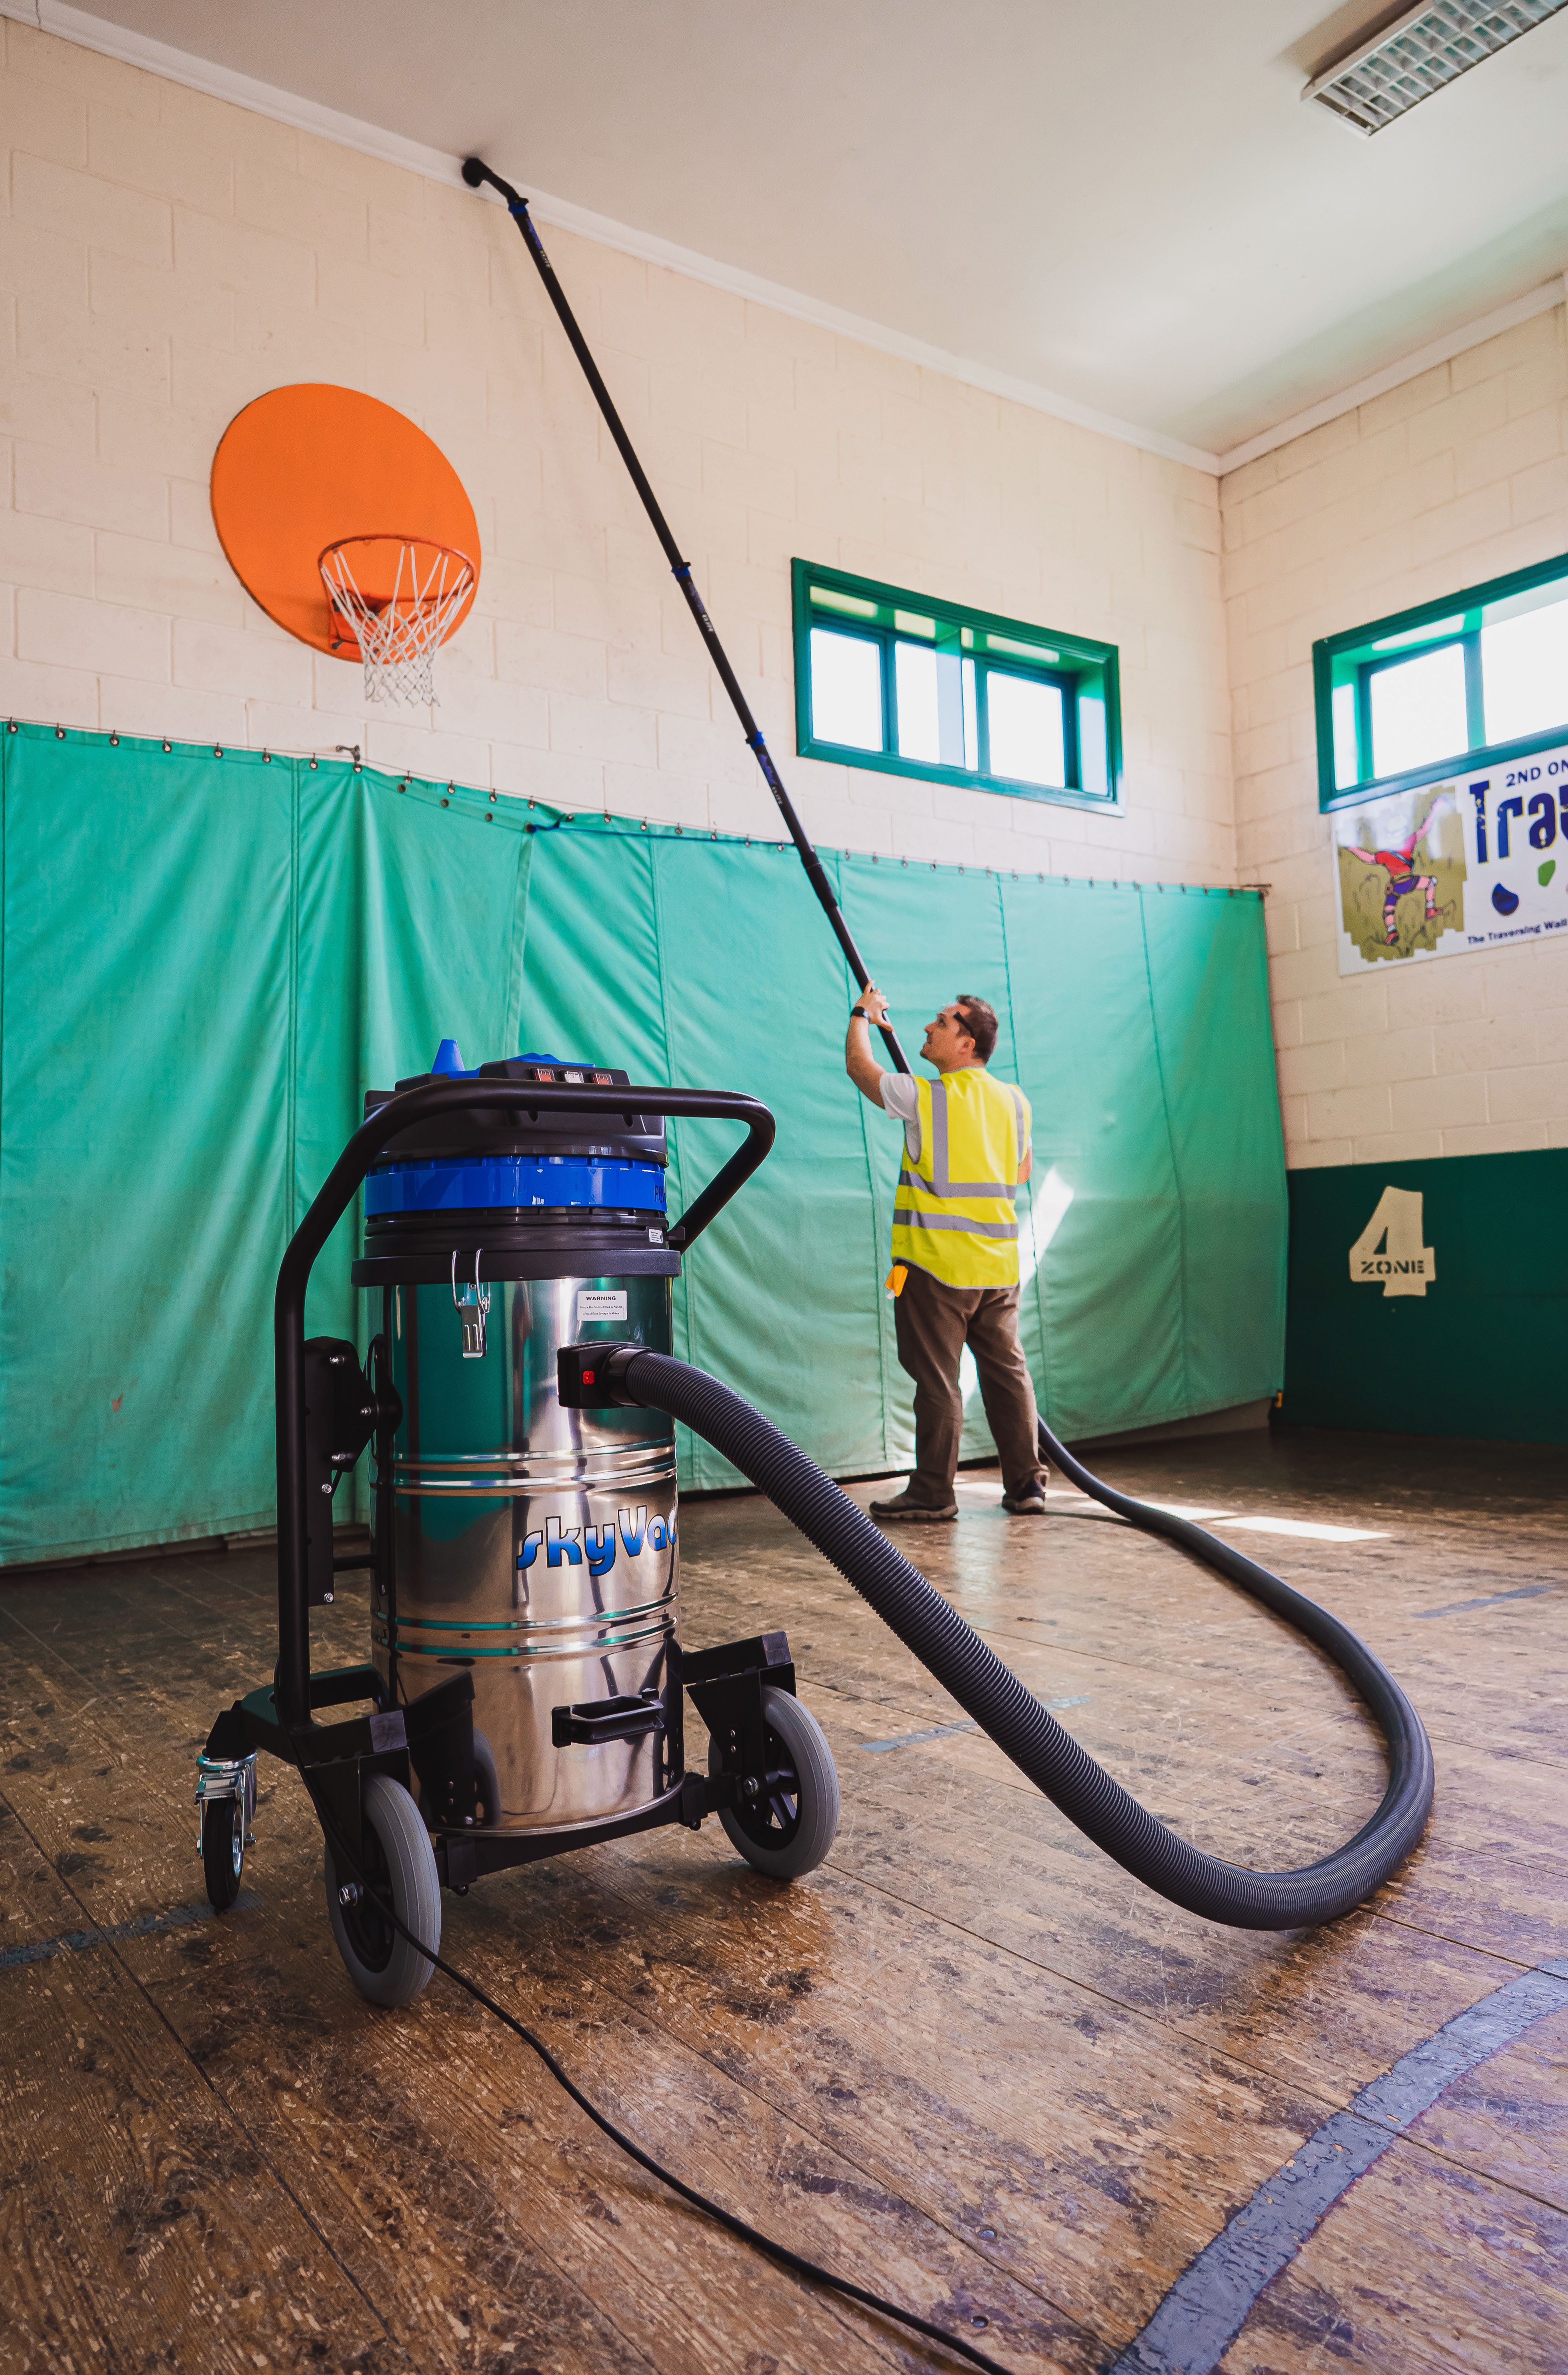 Internal High-Reach Vacuuming